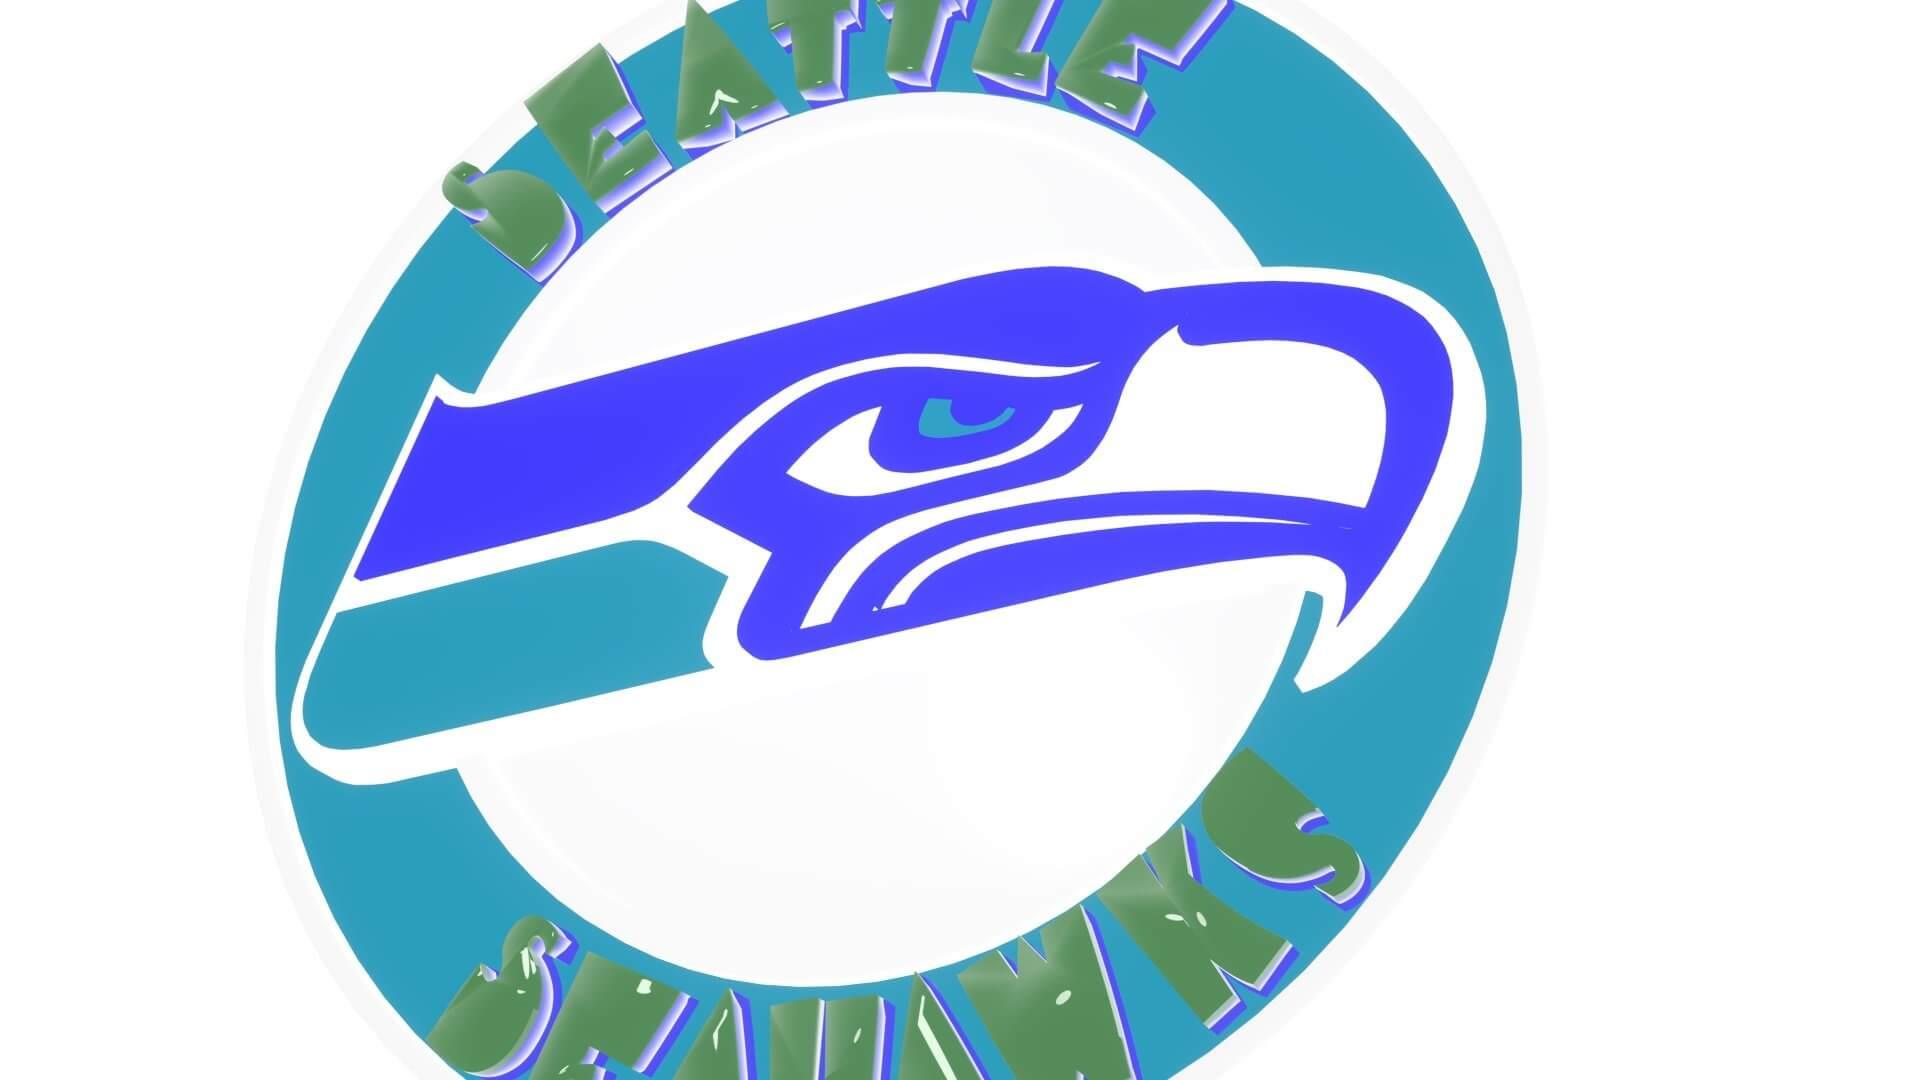 Seahawks Logo Disc 3d Model